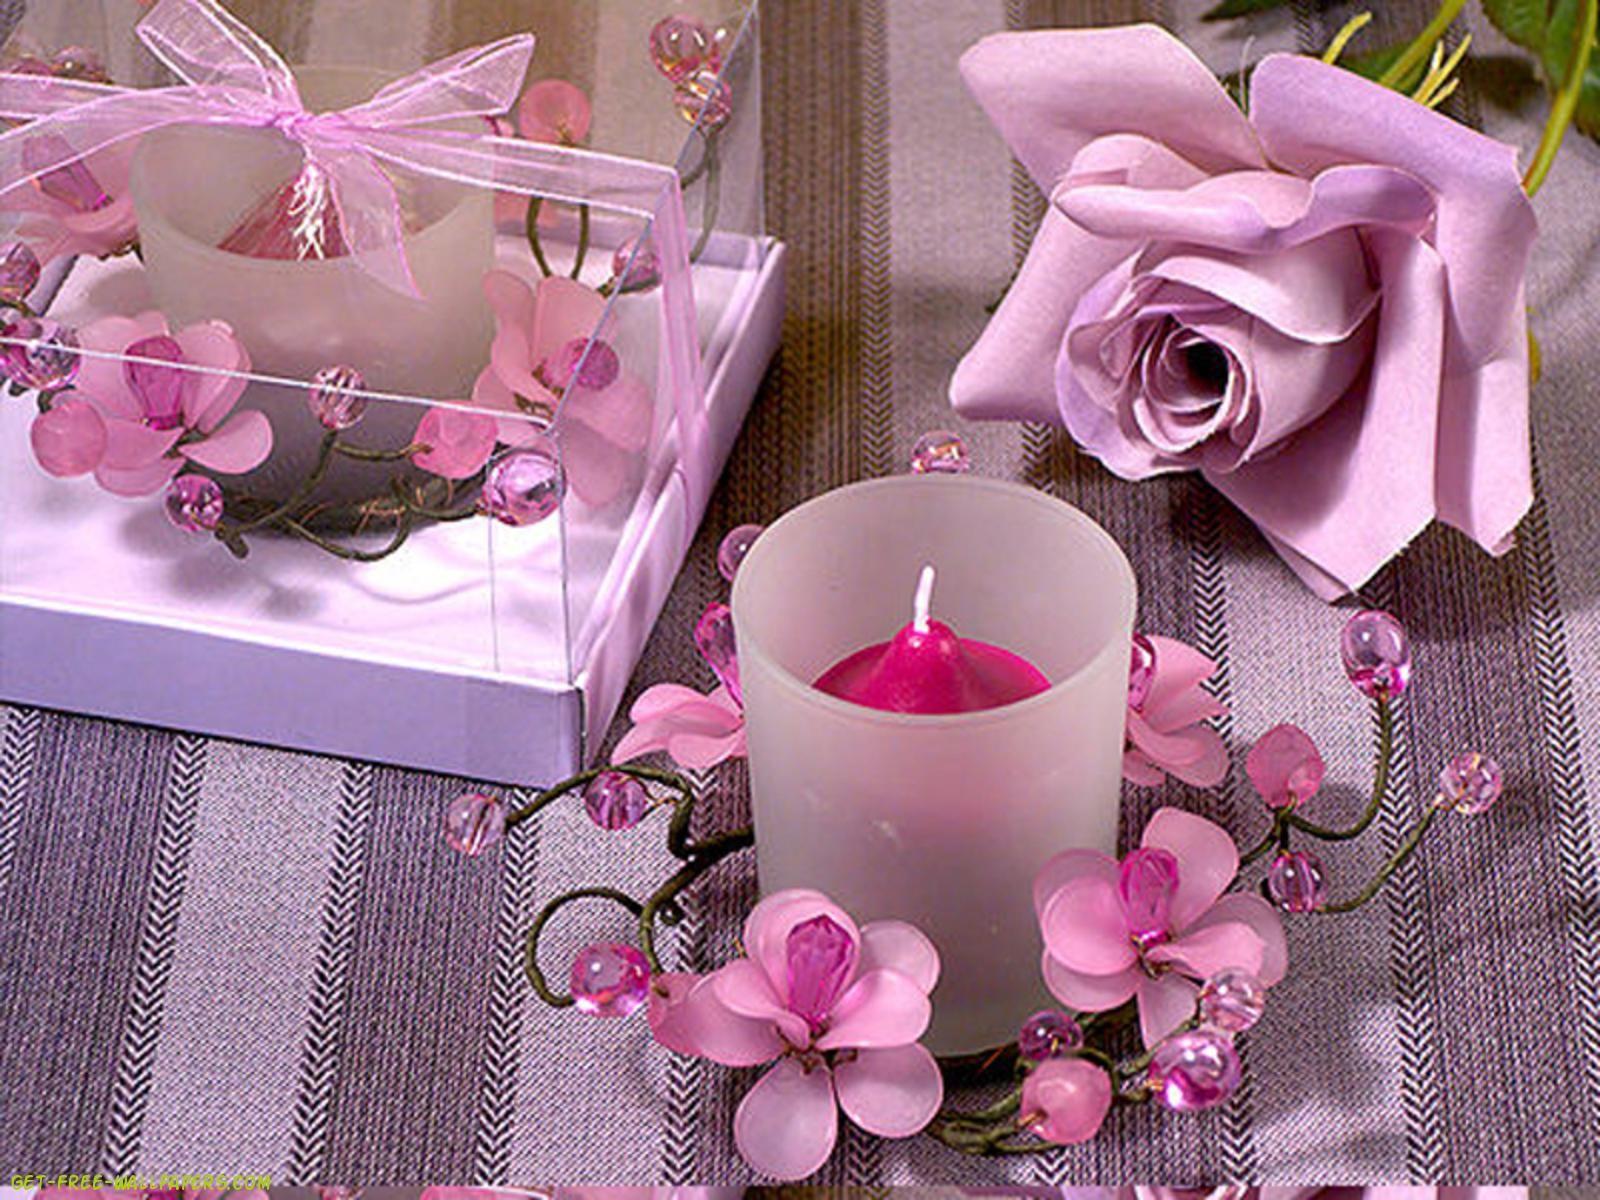 Romantic Candles Wallpaper   CANDLES   Pinterest   Romantic candles